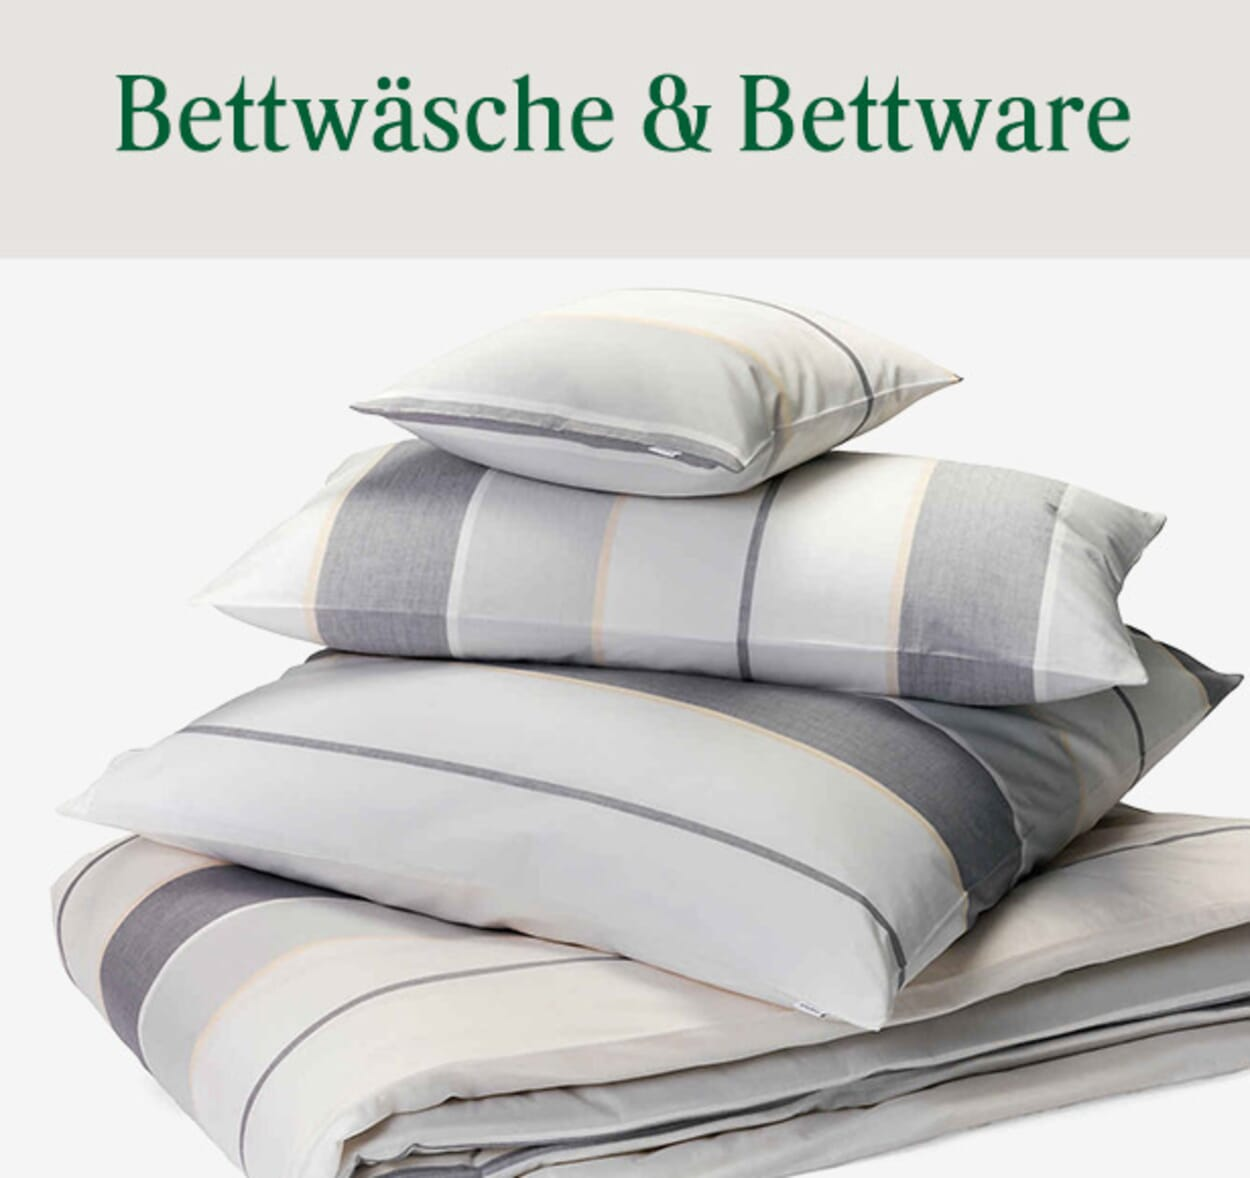 Bettwäsche & Bettwaren